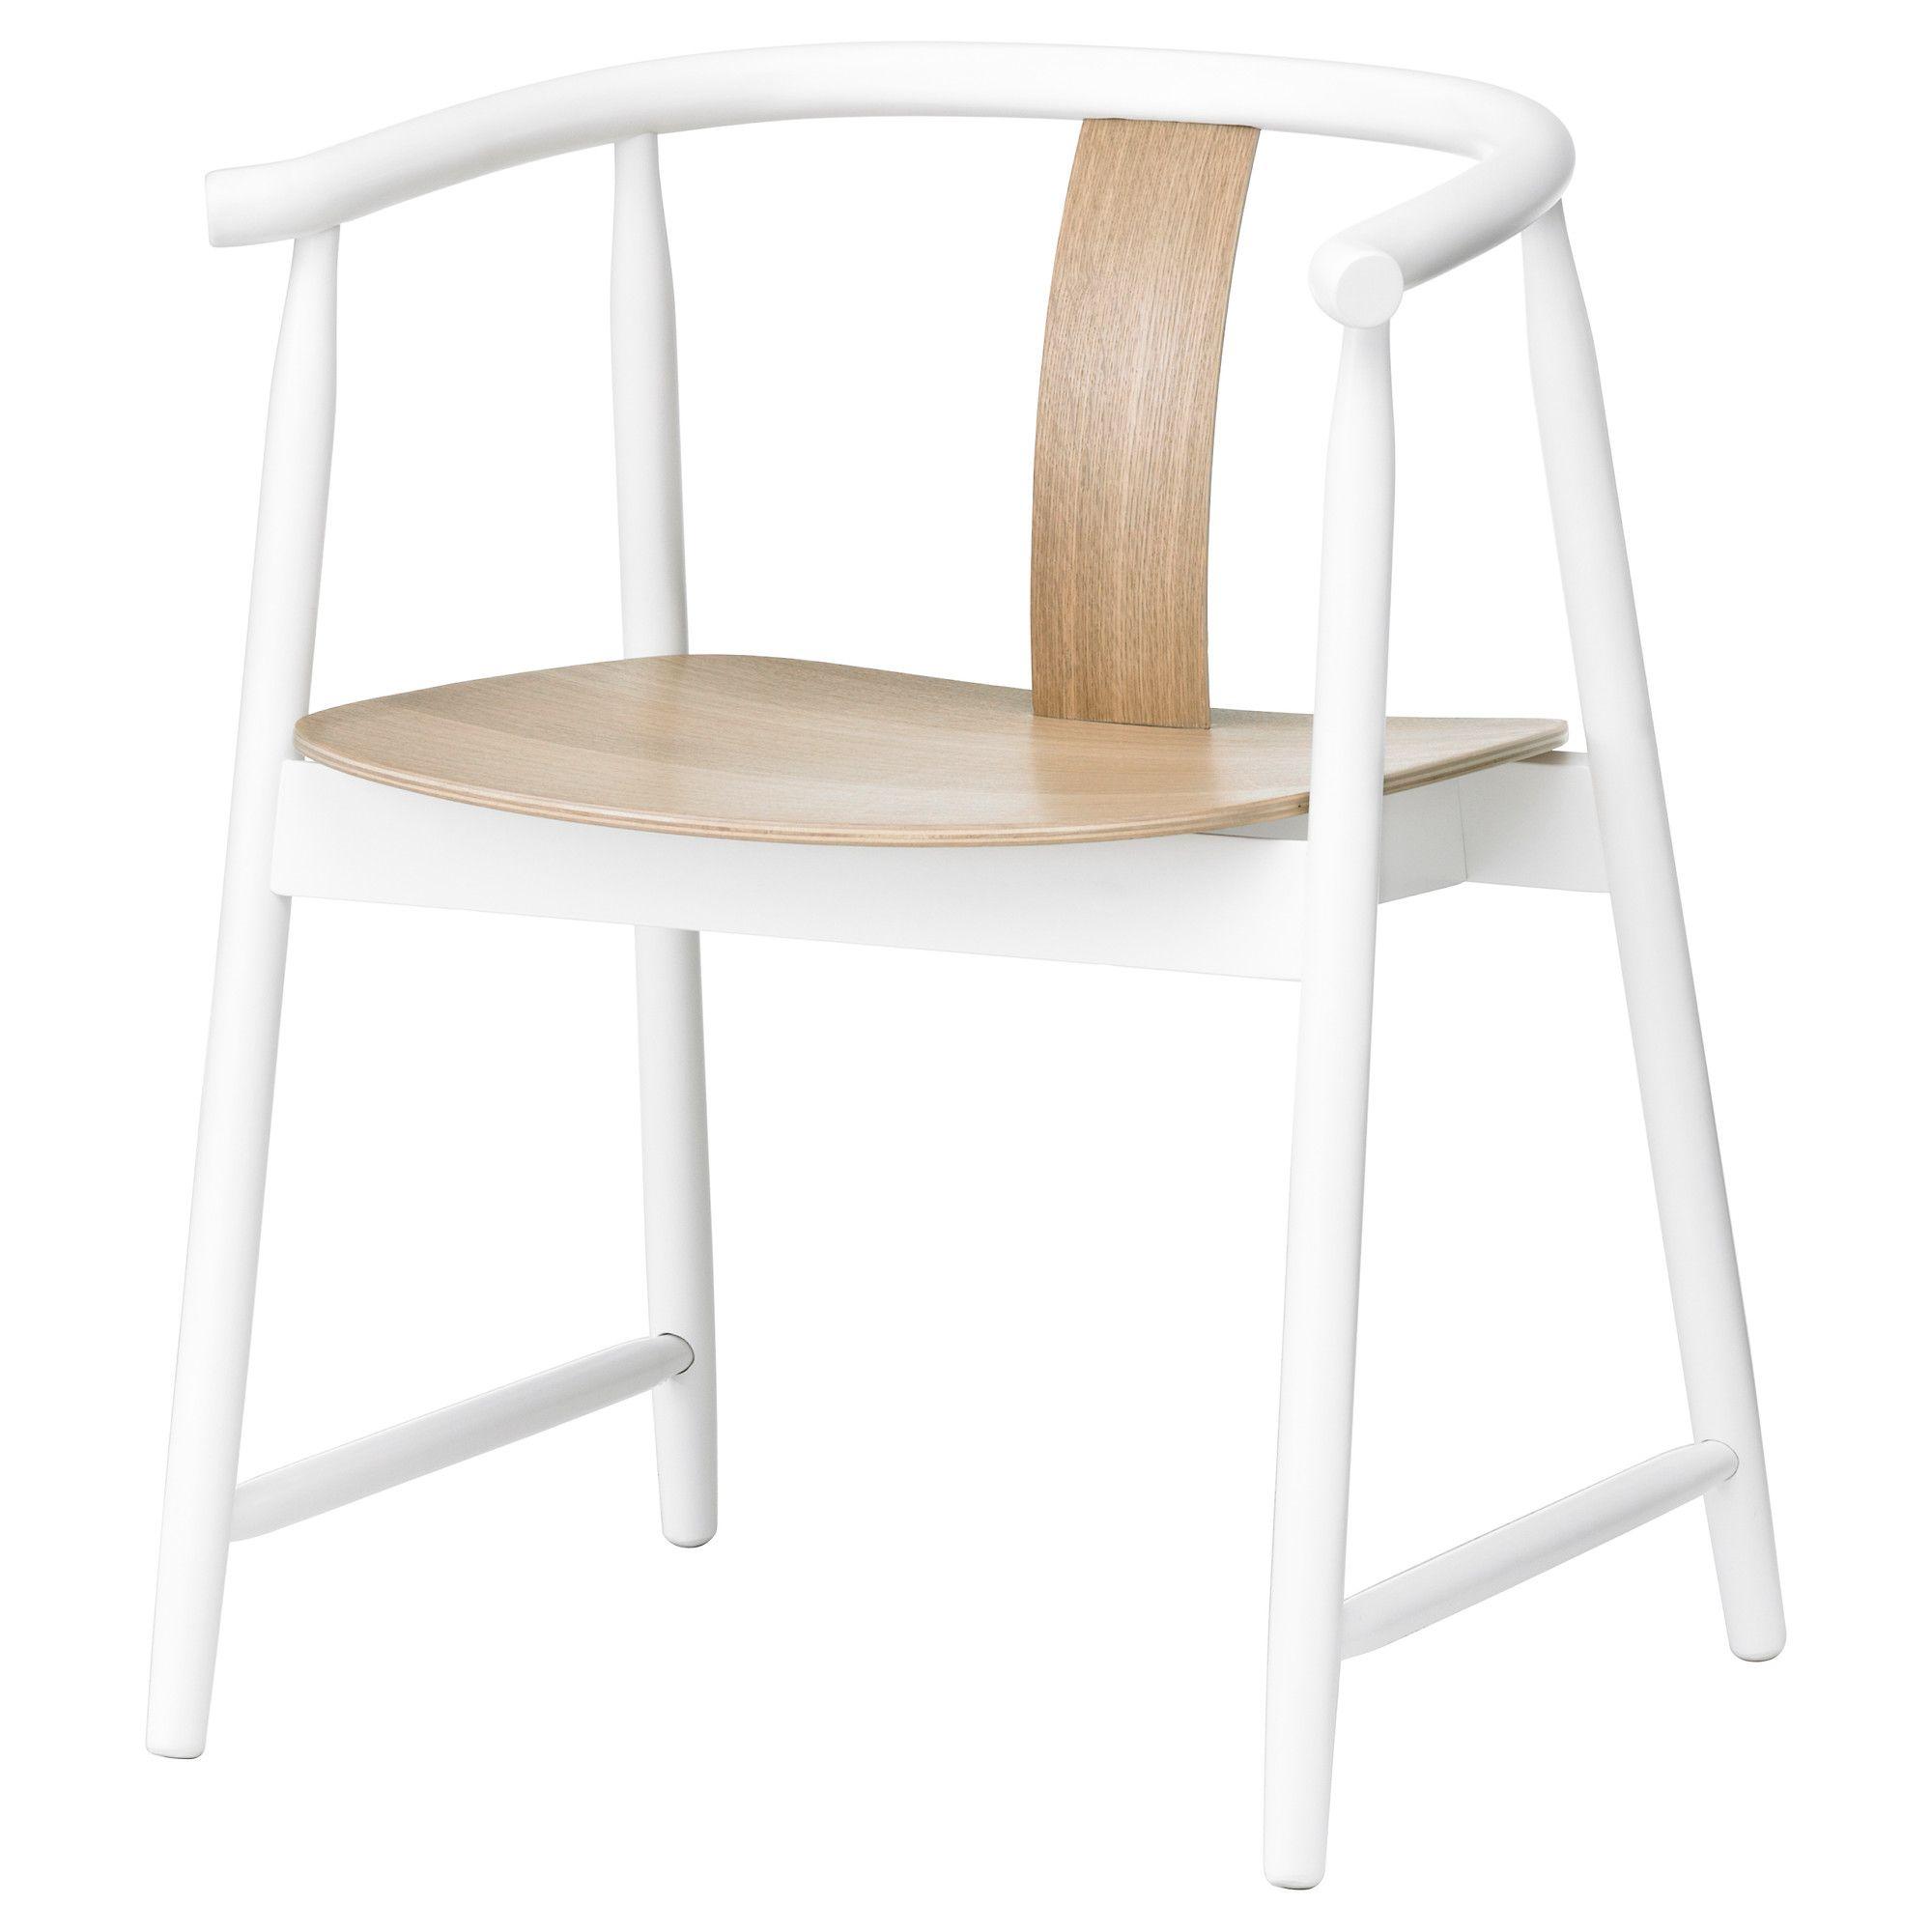 TRENDIG 2013 Armchair white/natural IKEA INTERIOR